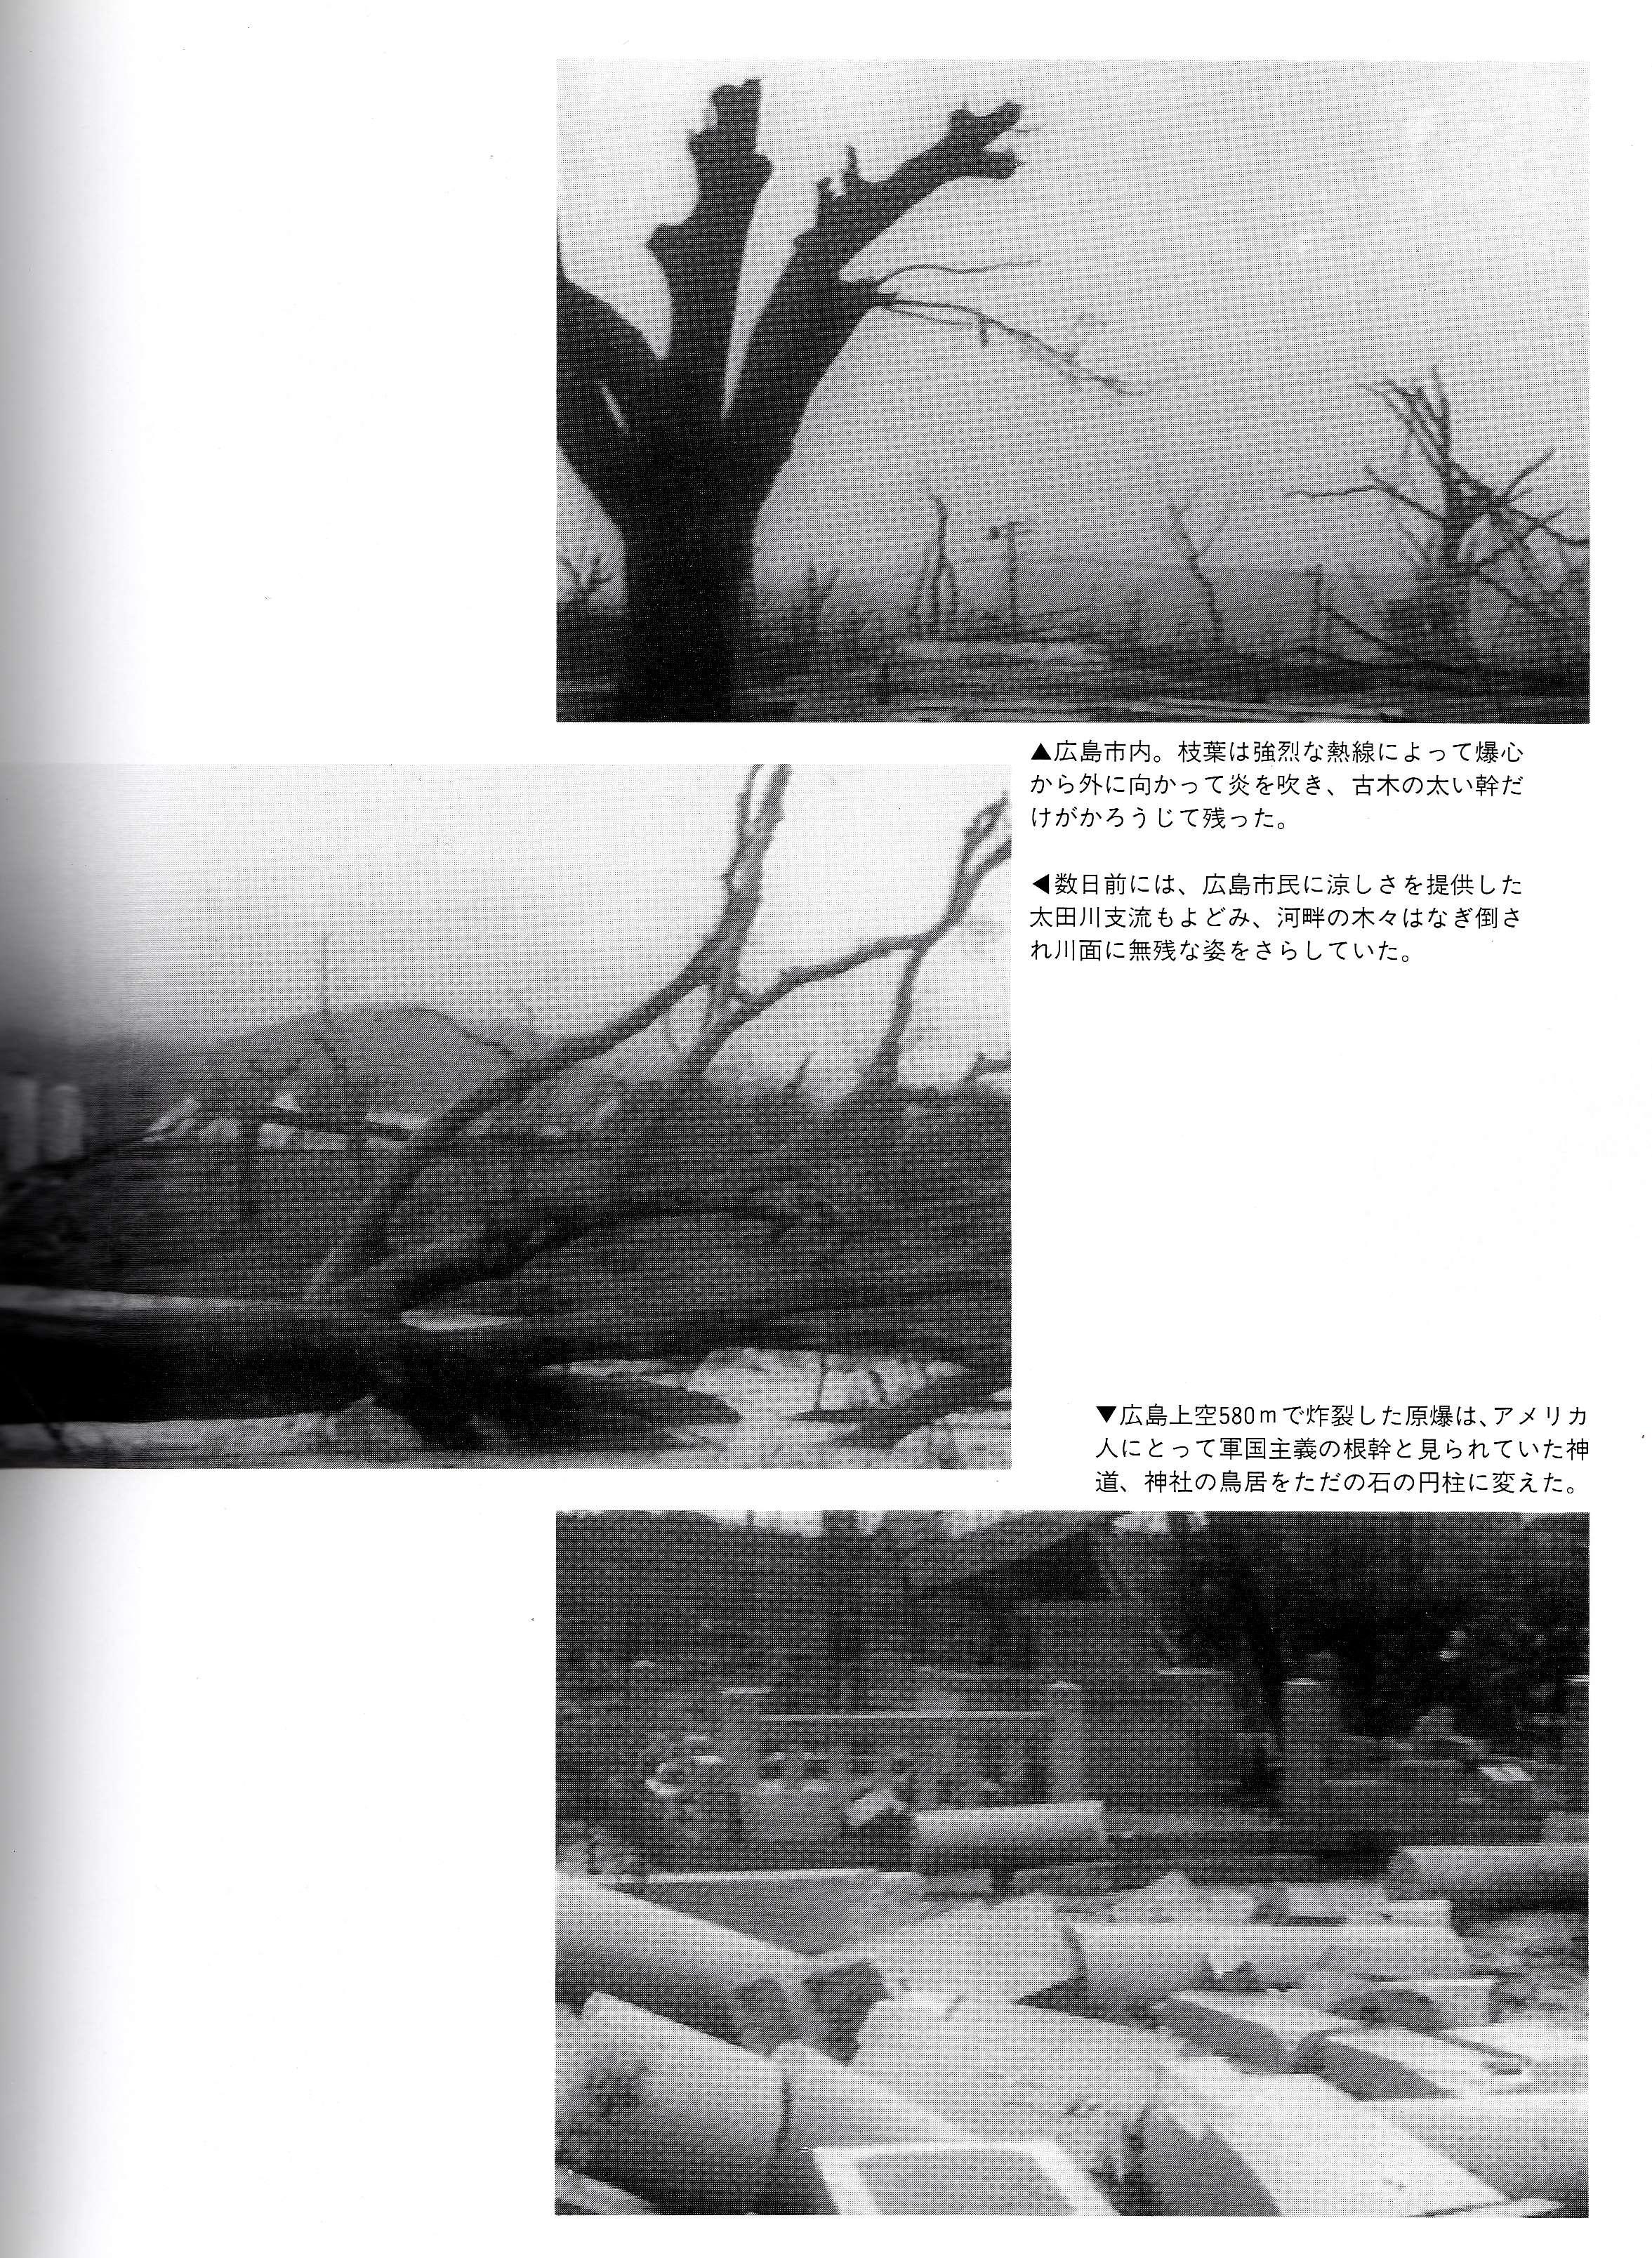 広島原爆の惨状_InPixio